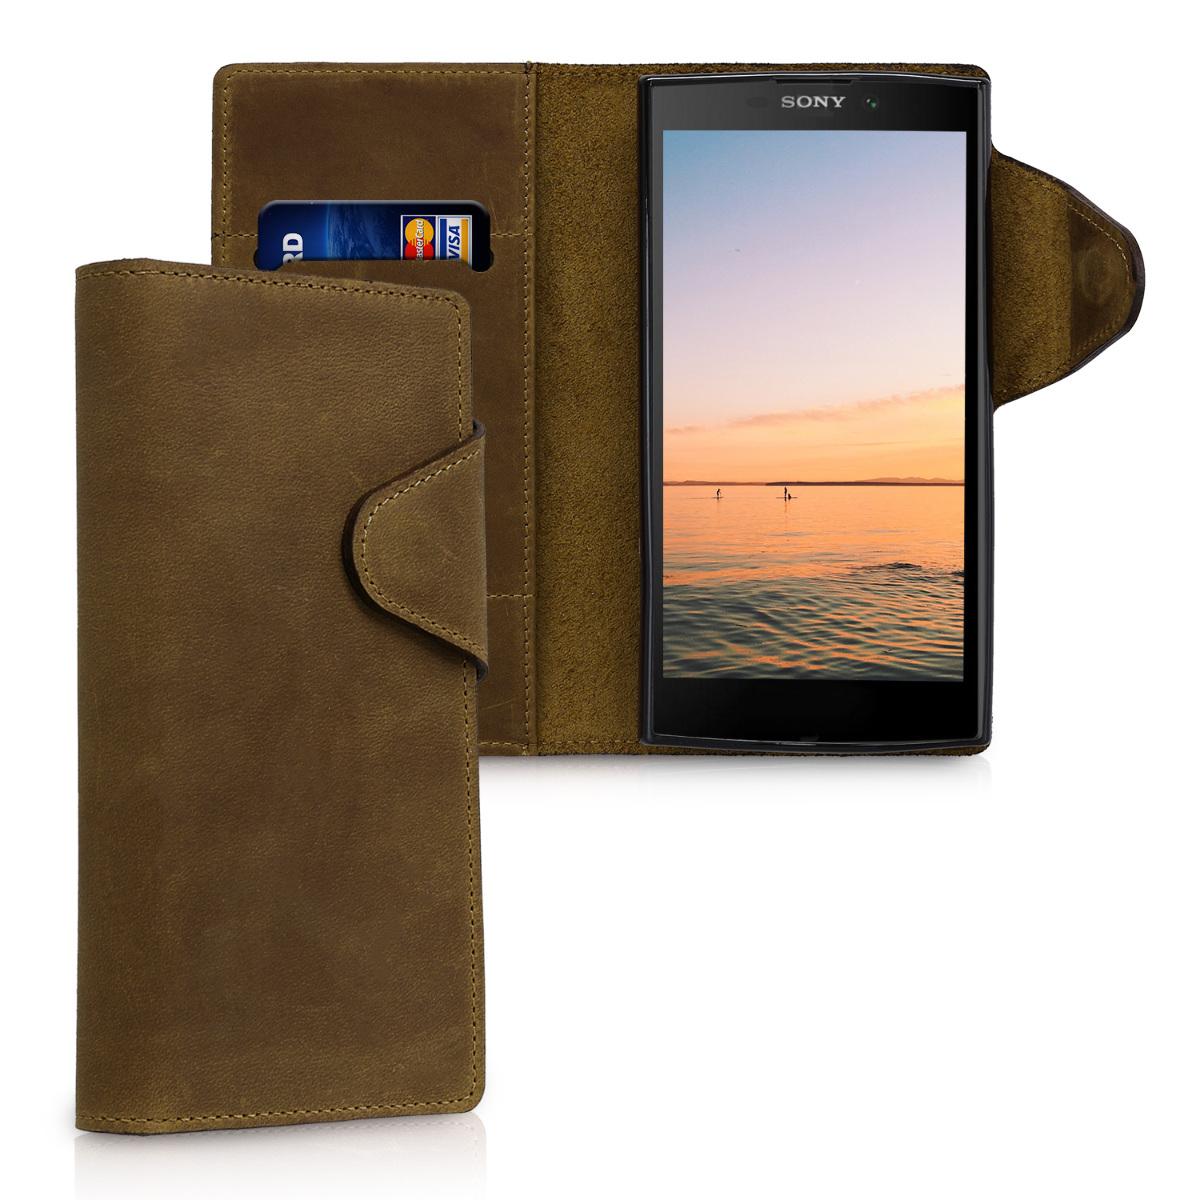 Kalibri Δερμάτινη Suede Θήκη - Πορτοφόλι Sony Xperia L2 - Brown (44759.05)